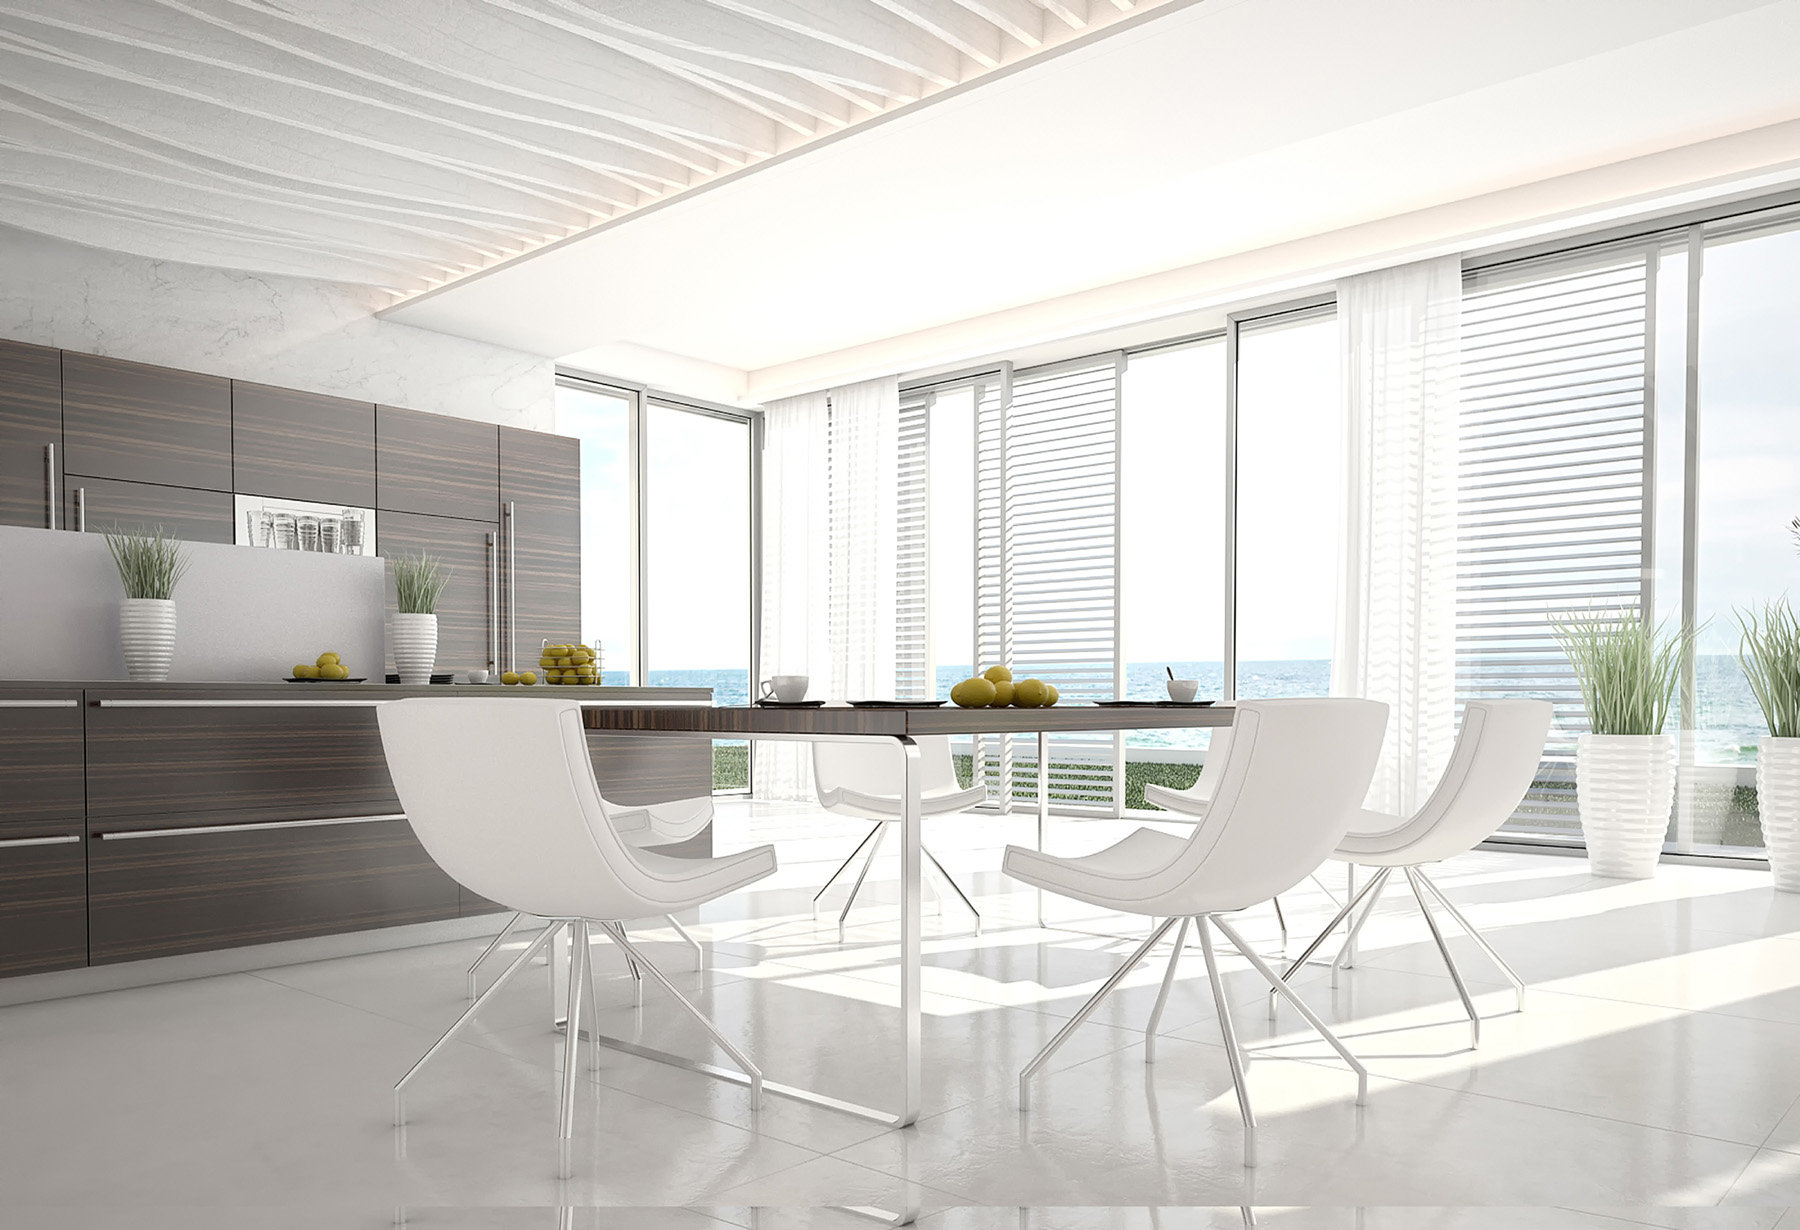 stylish kitchen with dark and white furniture